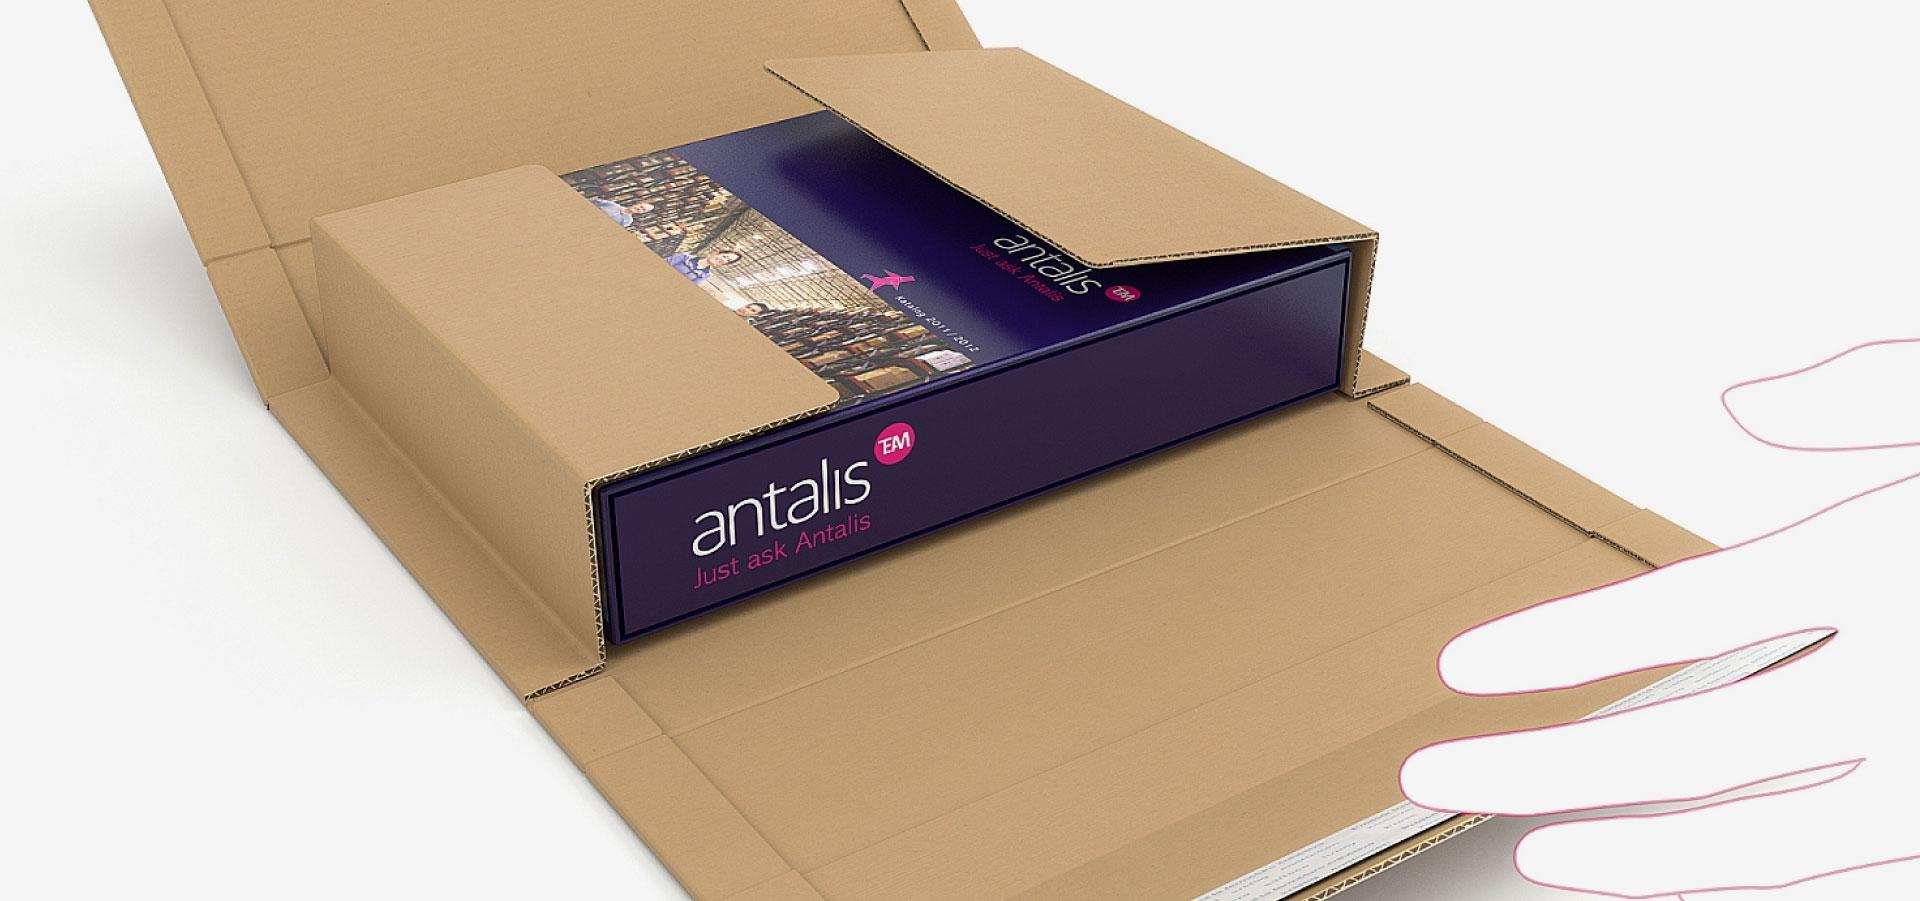 antalis-box-opening